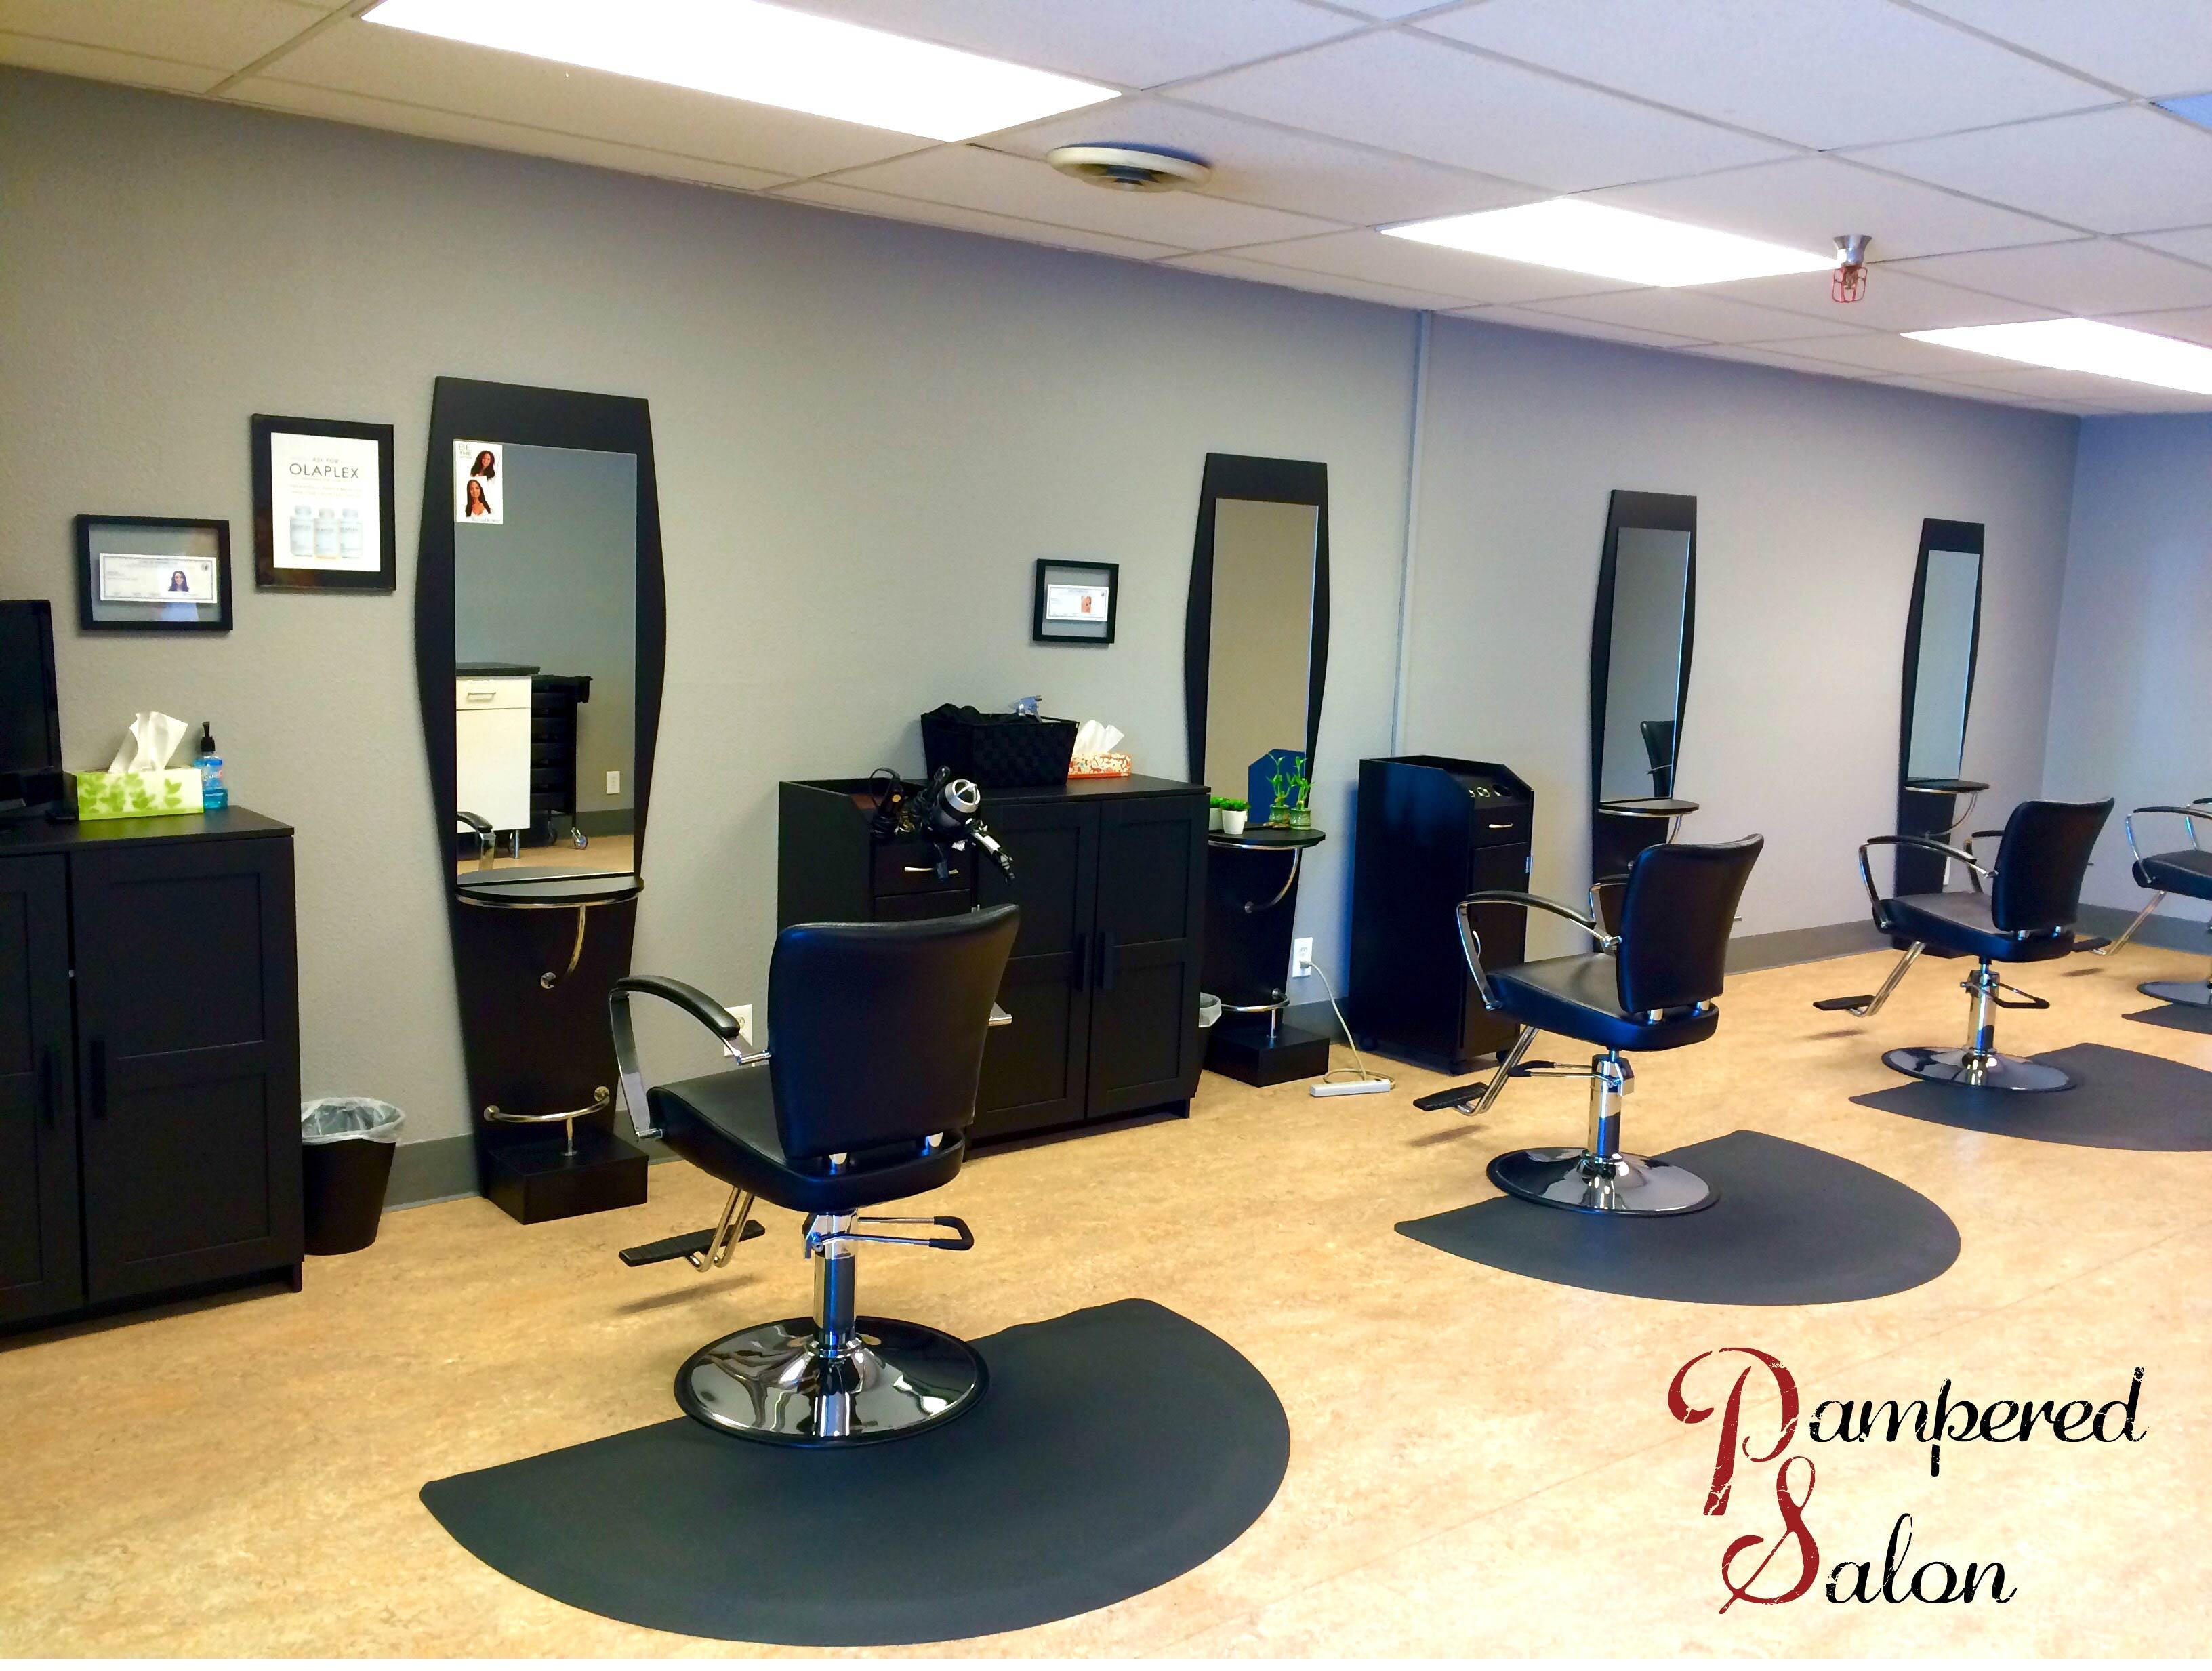 Pampered Salon image 5